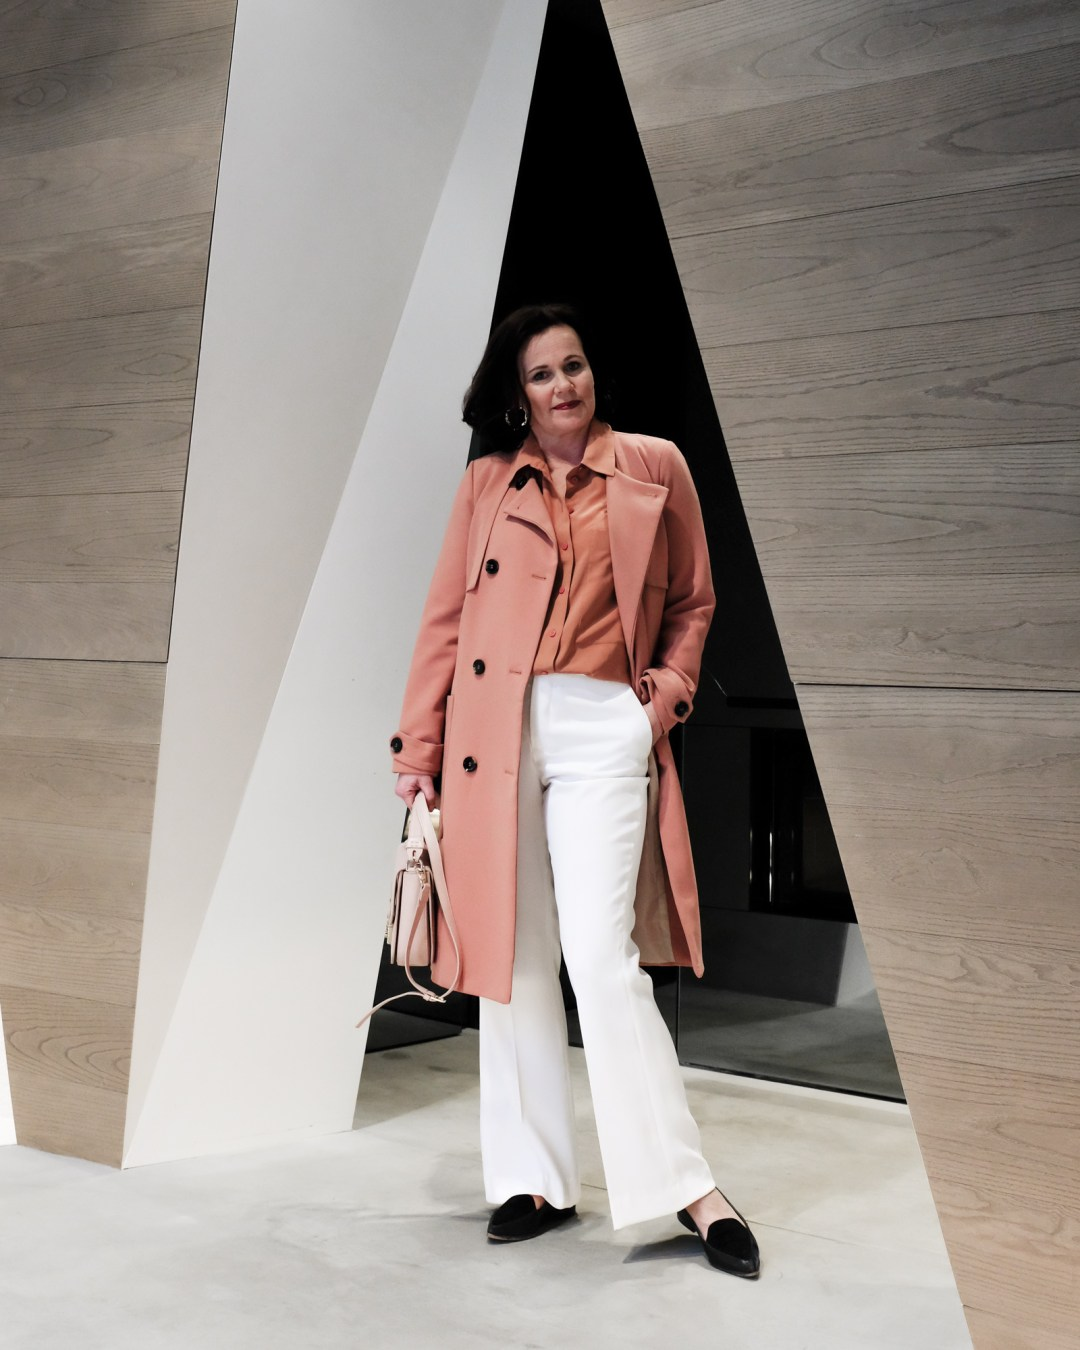 inastil, Trenchcoat, Springcoat, Frühjahrsmode, Stilberatung, Ü50Mode, Modeberatung, Frühlingsfarben, Modeblogger-8